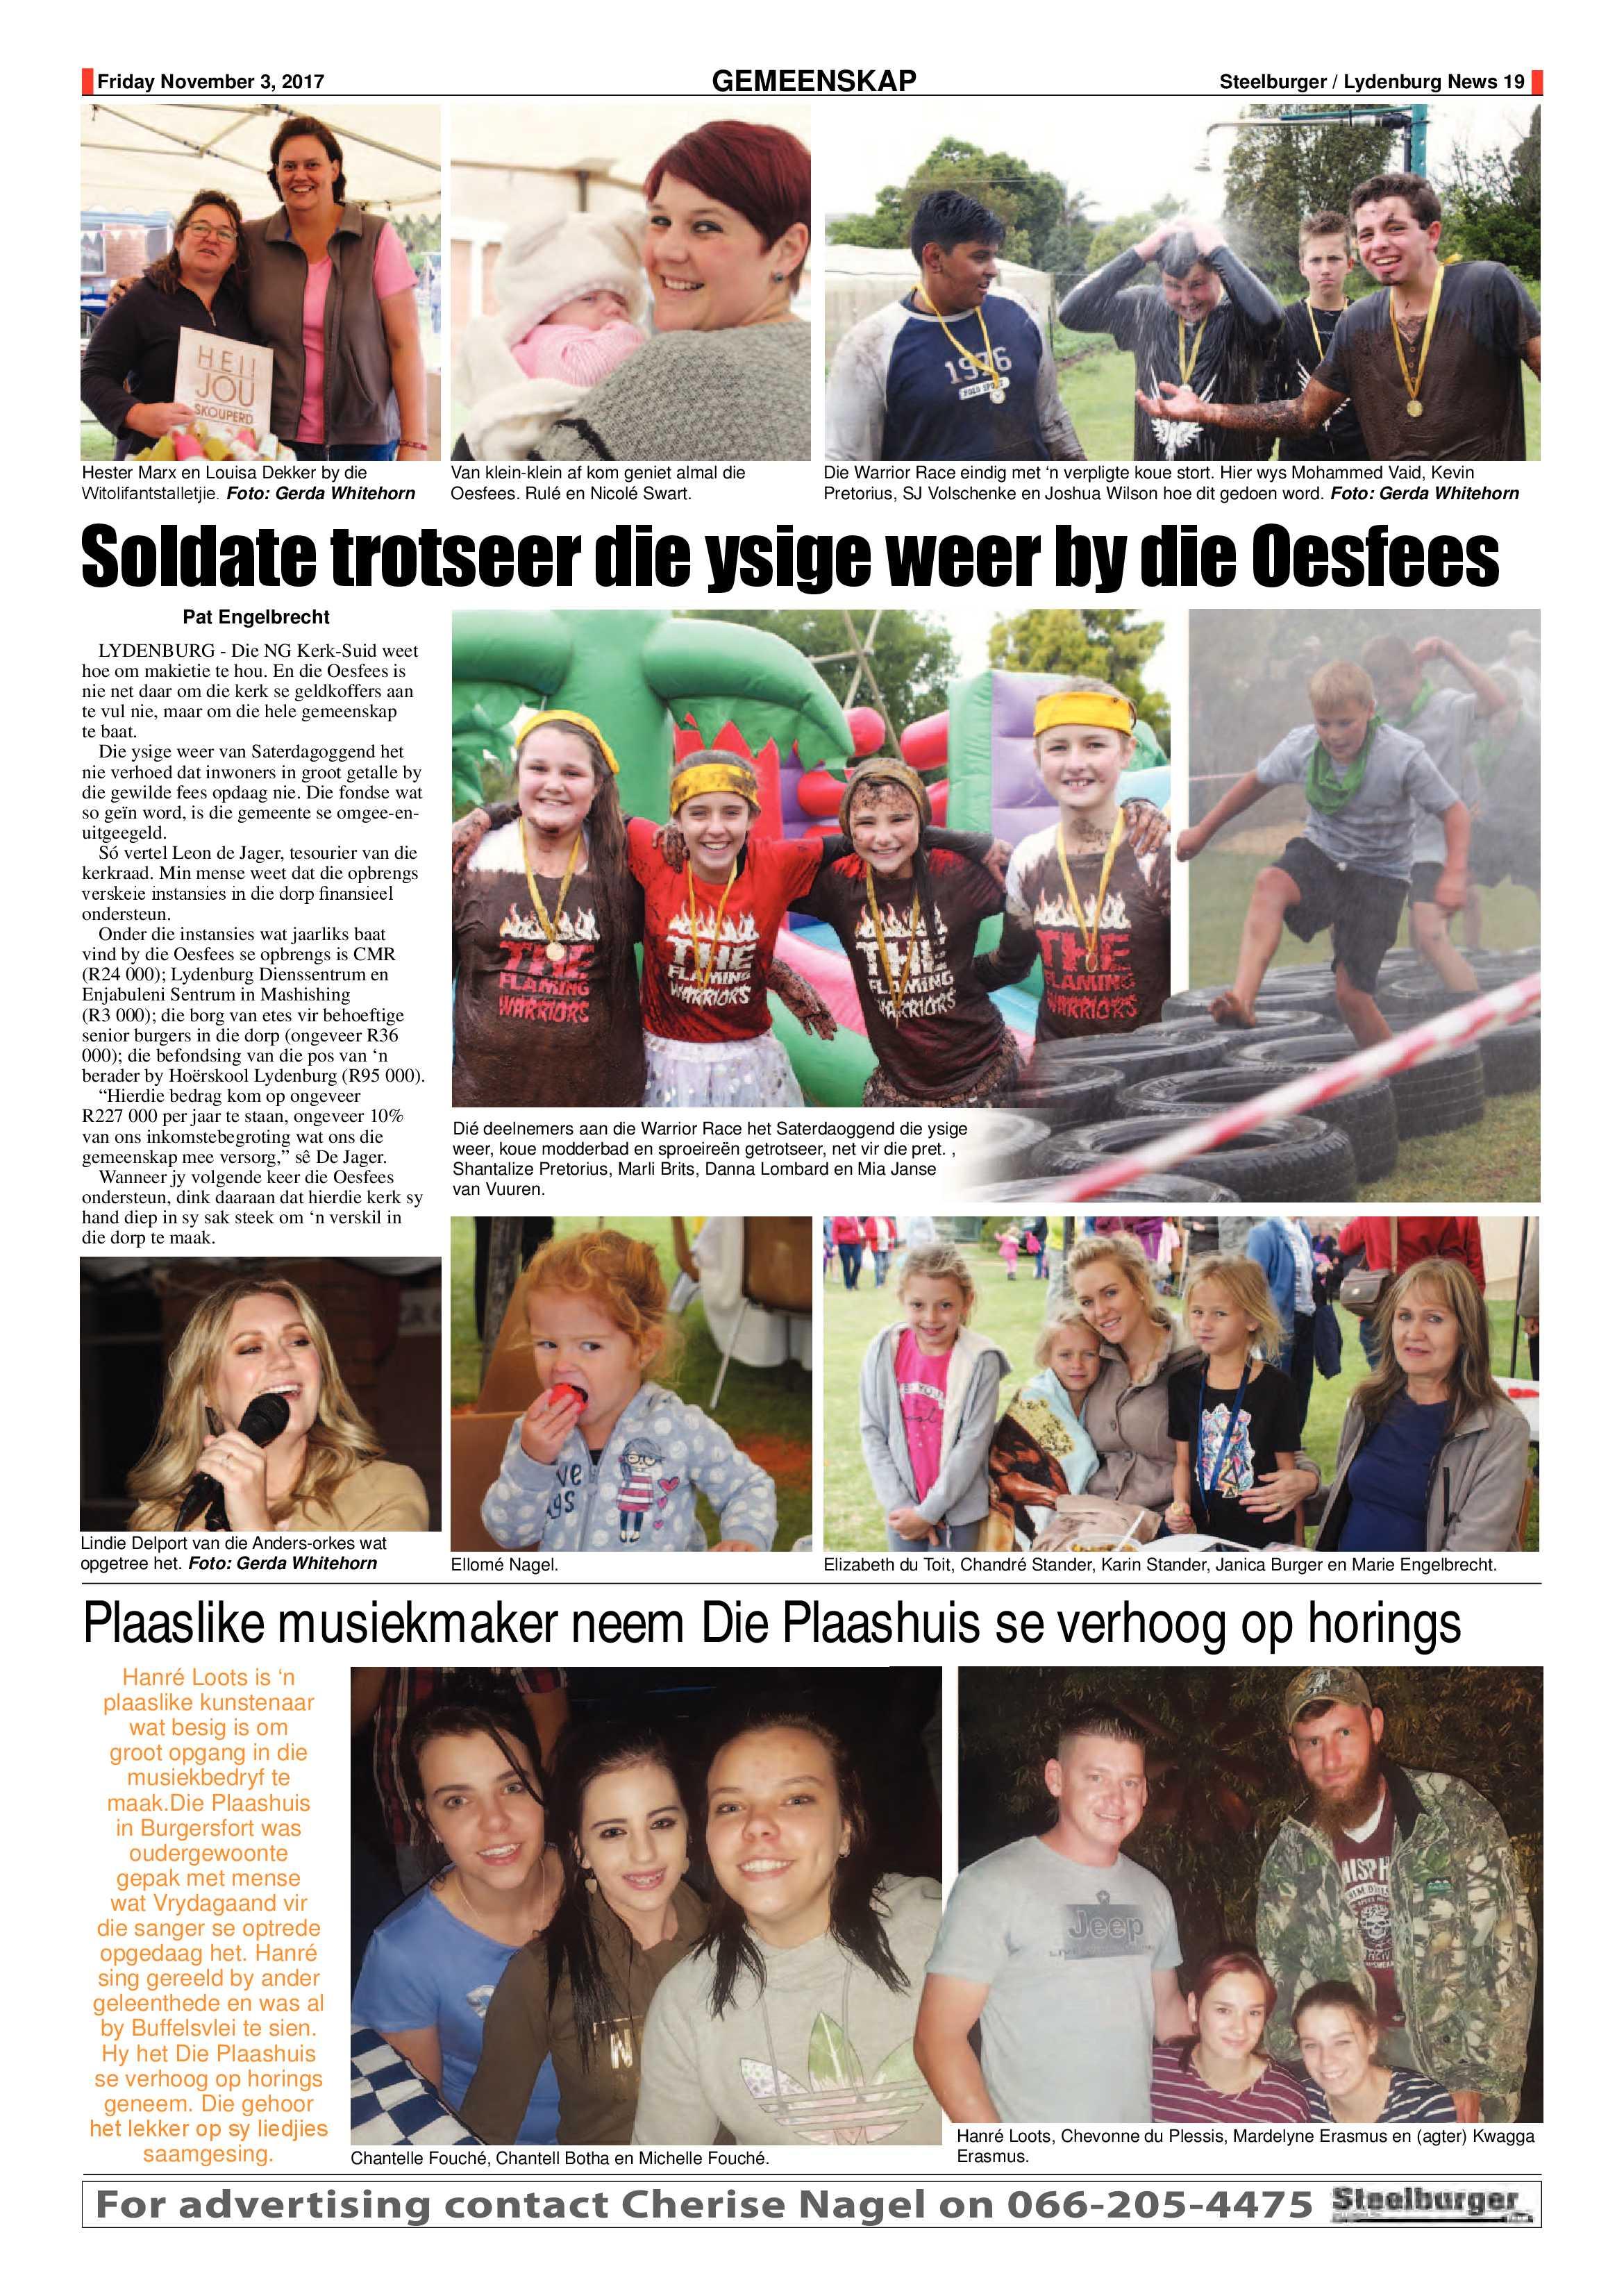 Steelburger News 3 November 2017 | Steelburger / Lydenburg News